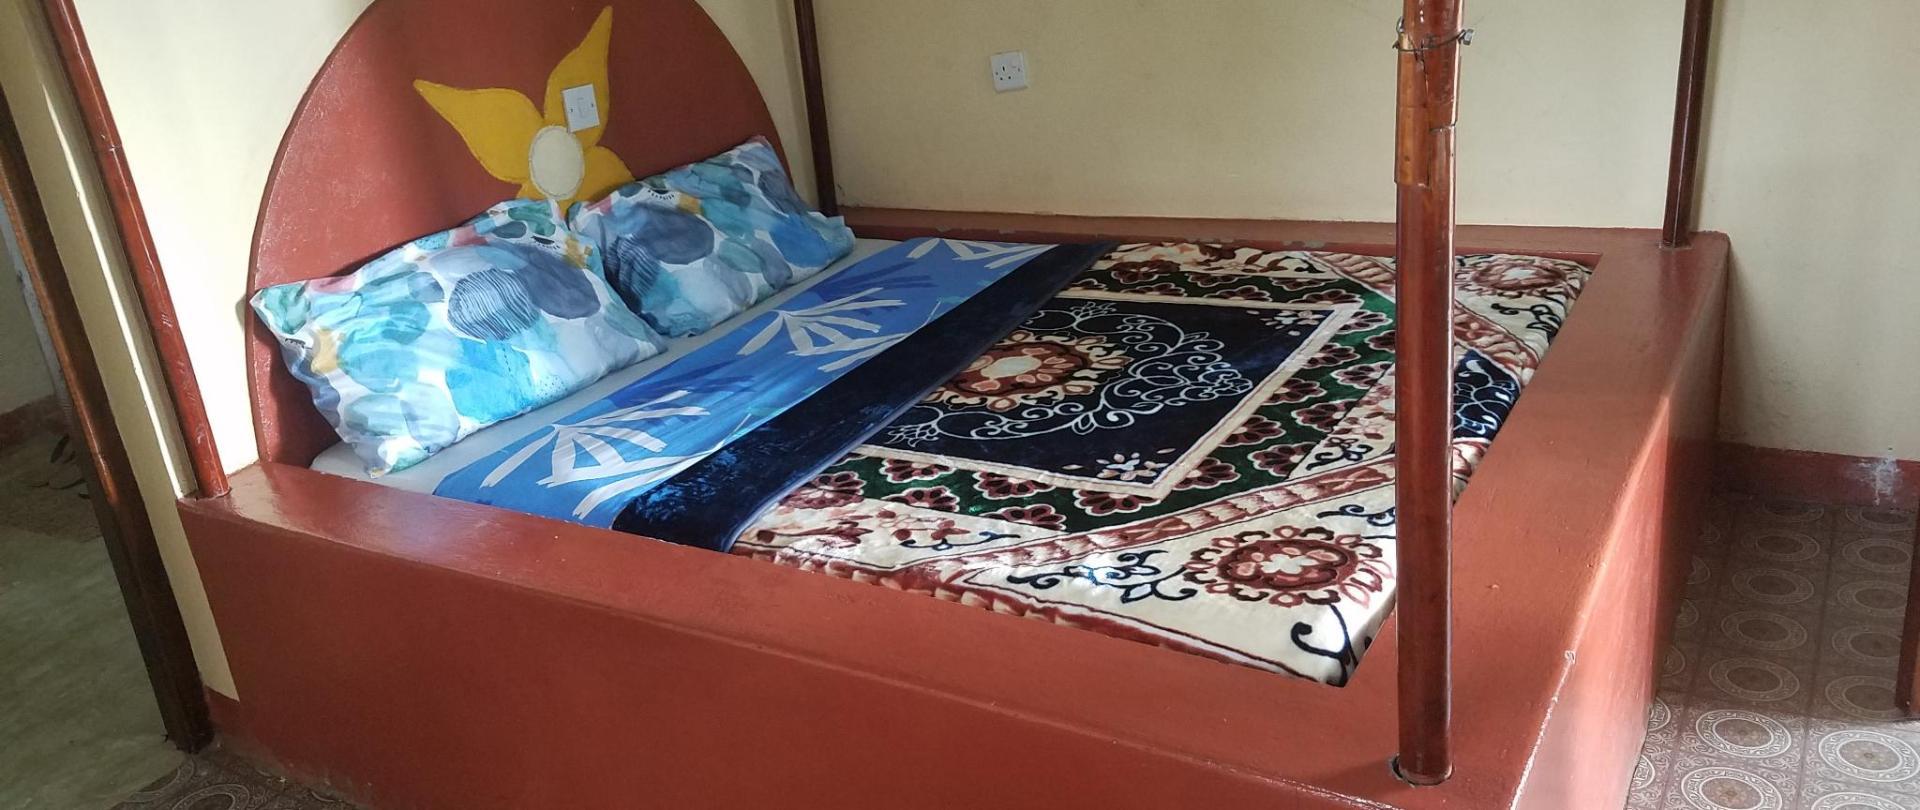 5. Hotel Room in Naivasha Kenya.jpg